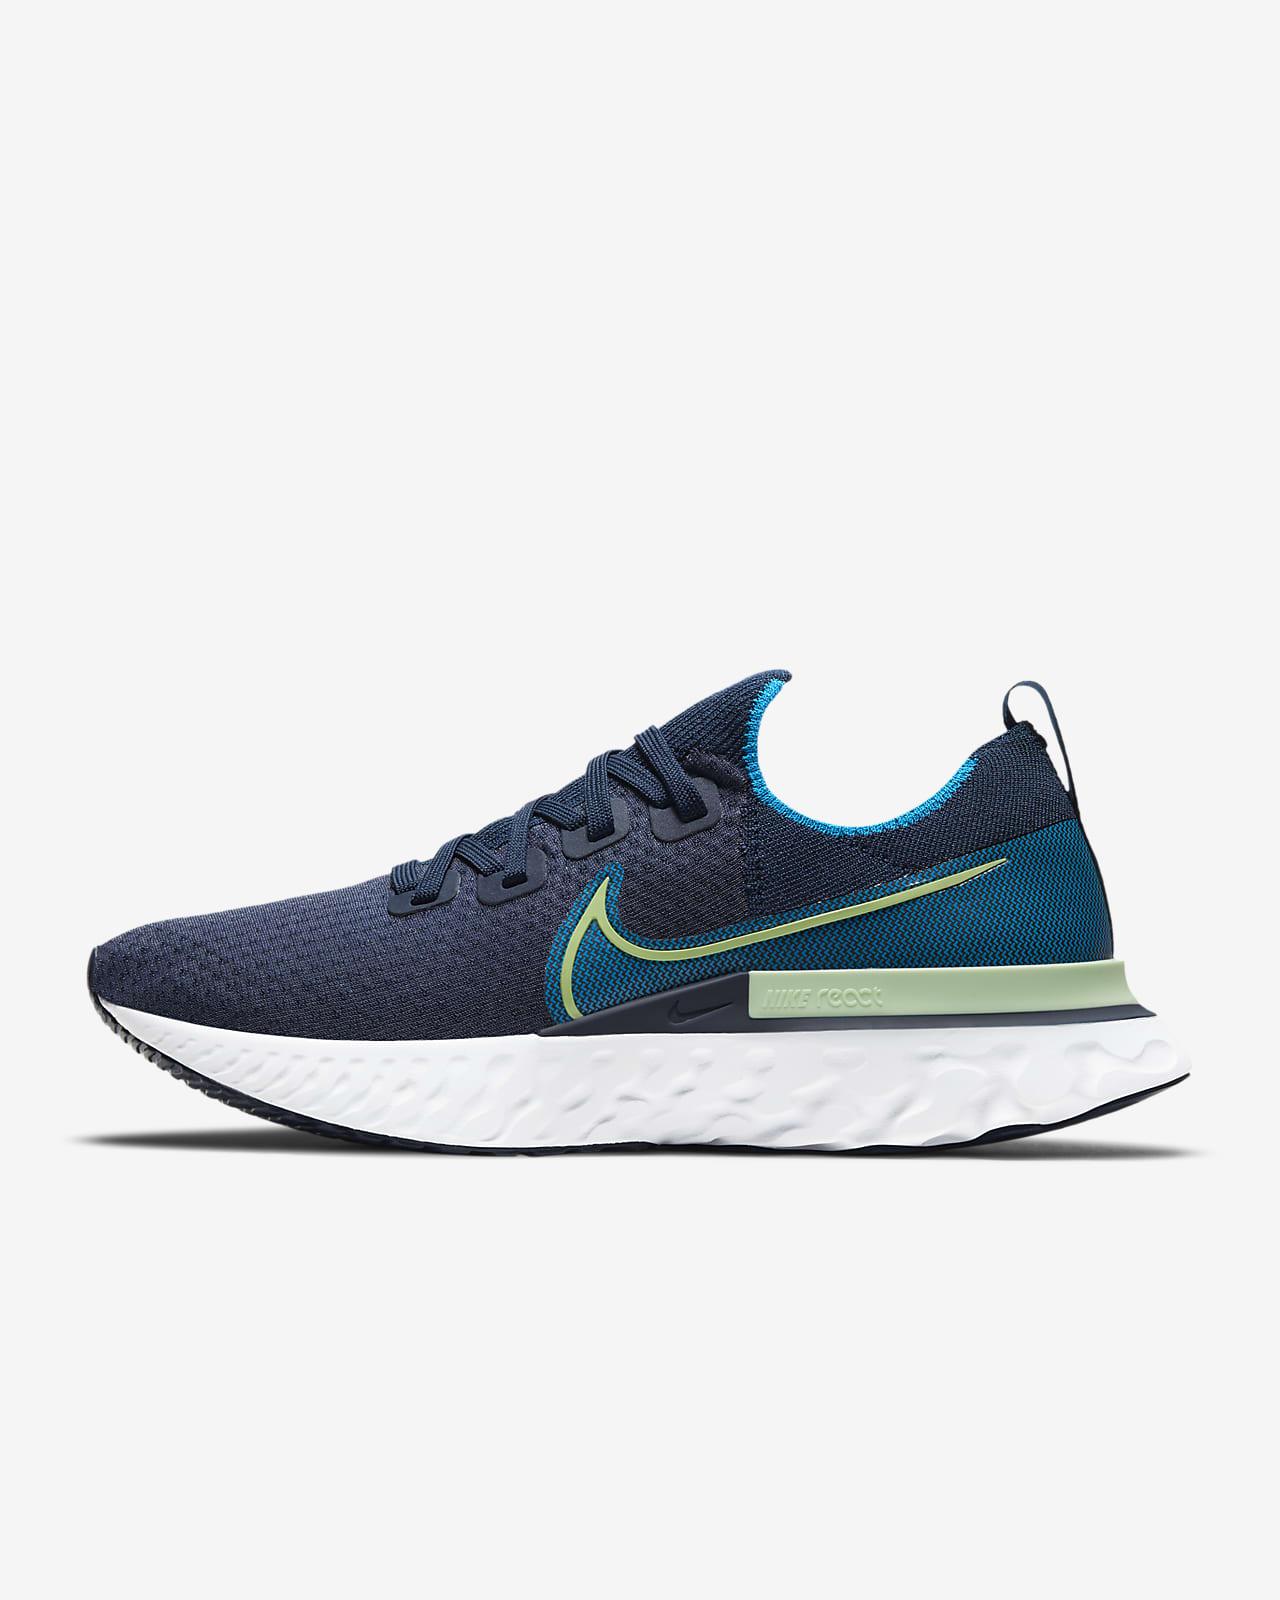 Мужские беговые кроссовки Nike React Infinity Run Flyknit